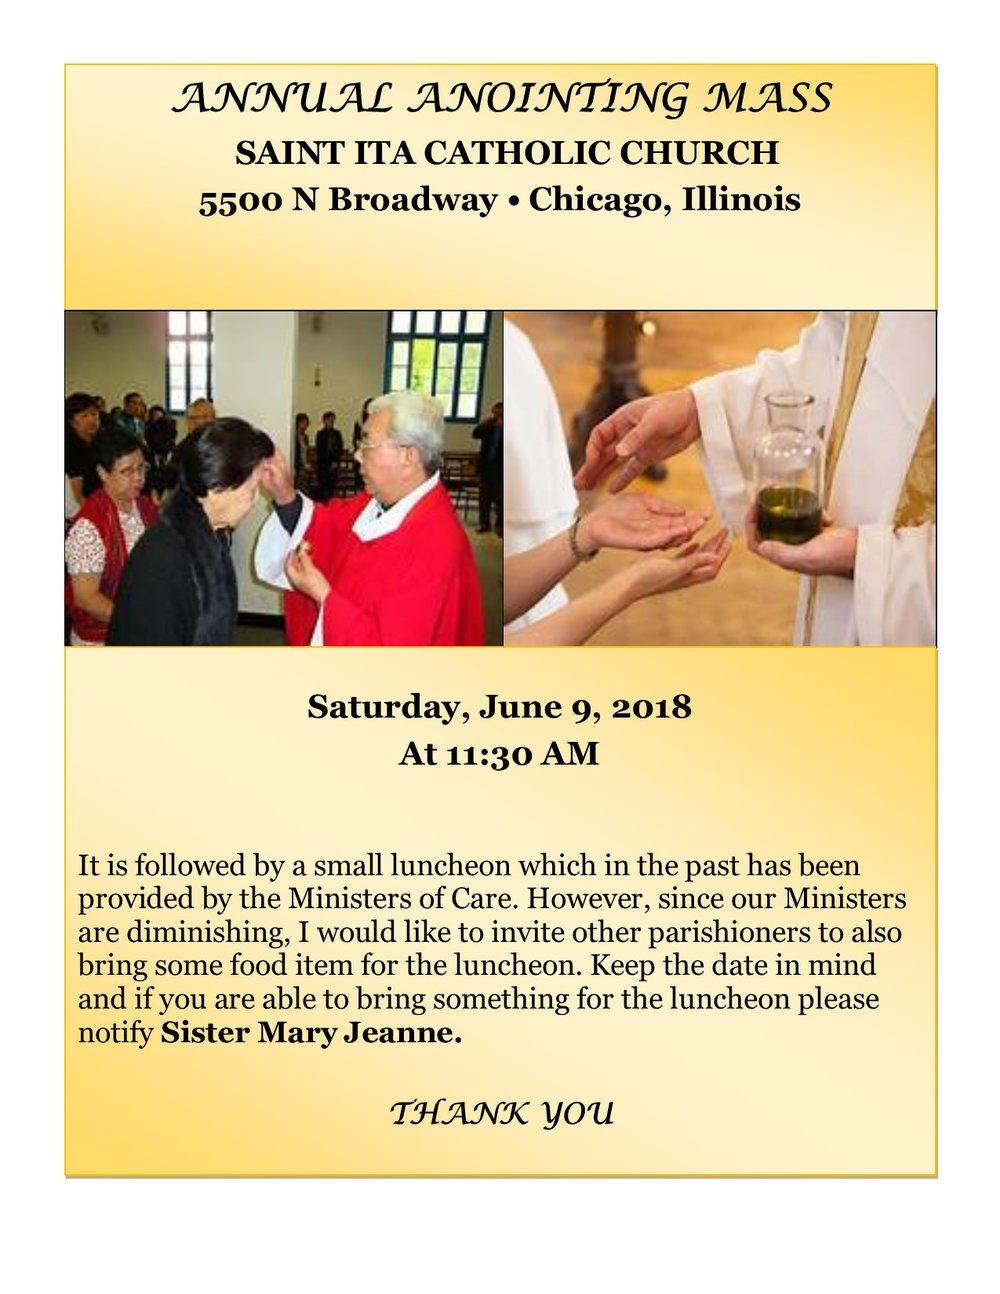 Annual Anointing Mass 6.9.18.jpg